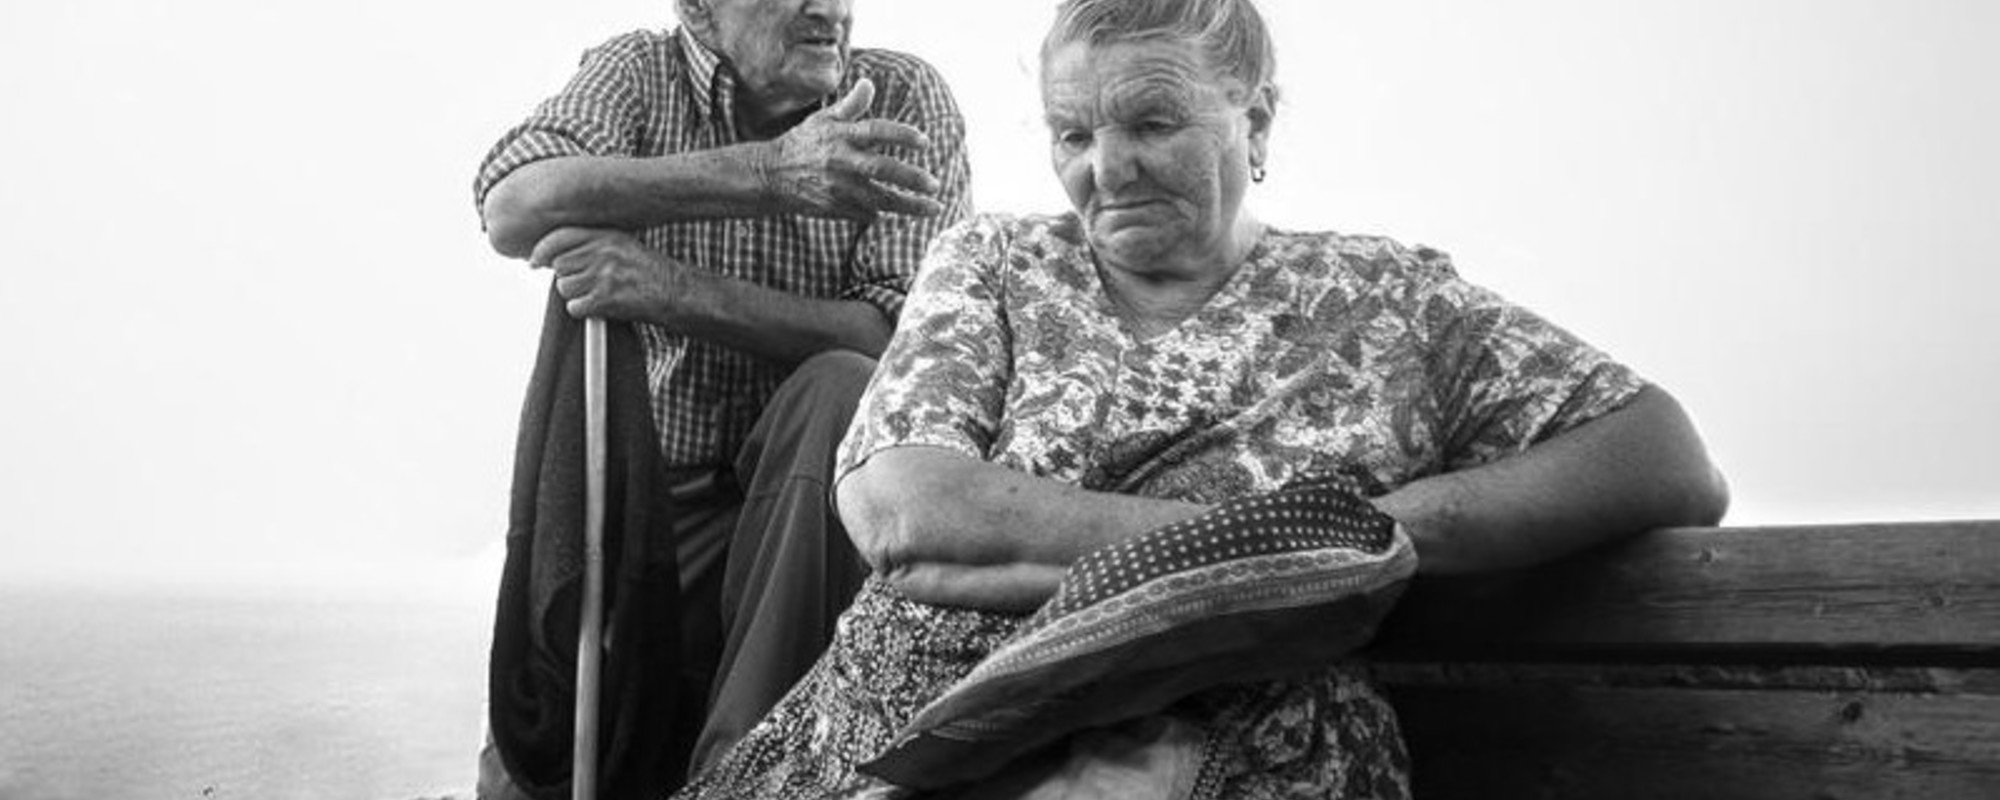 Tα Χρόνια του Μνημονίου στην Ελλάδα Μέσα από τα Μάτια Ενός Ιρανού